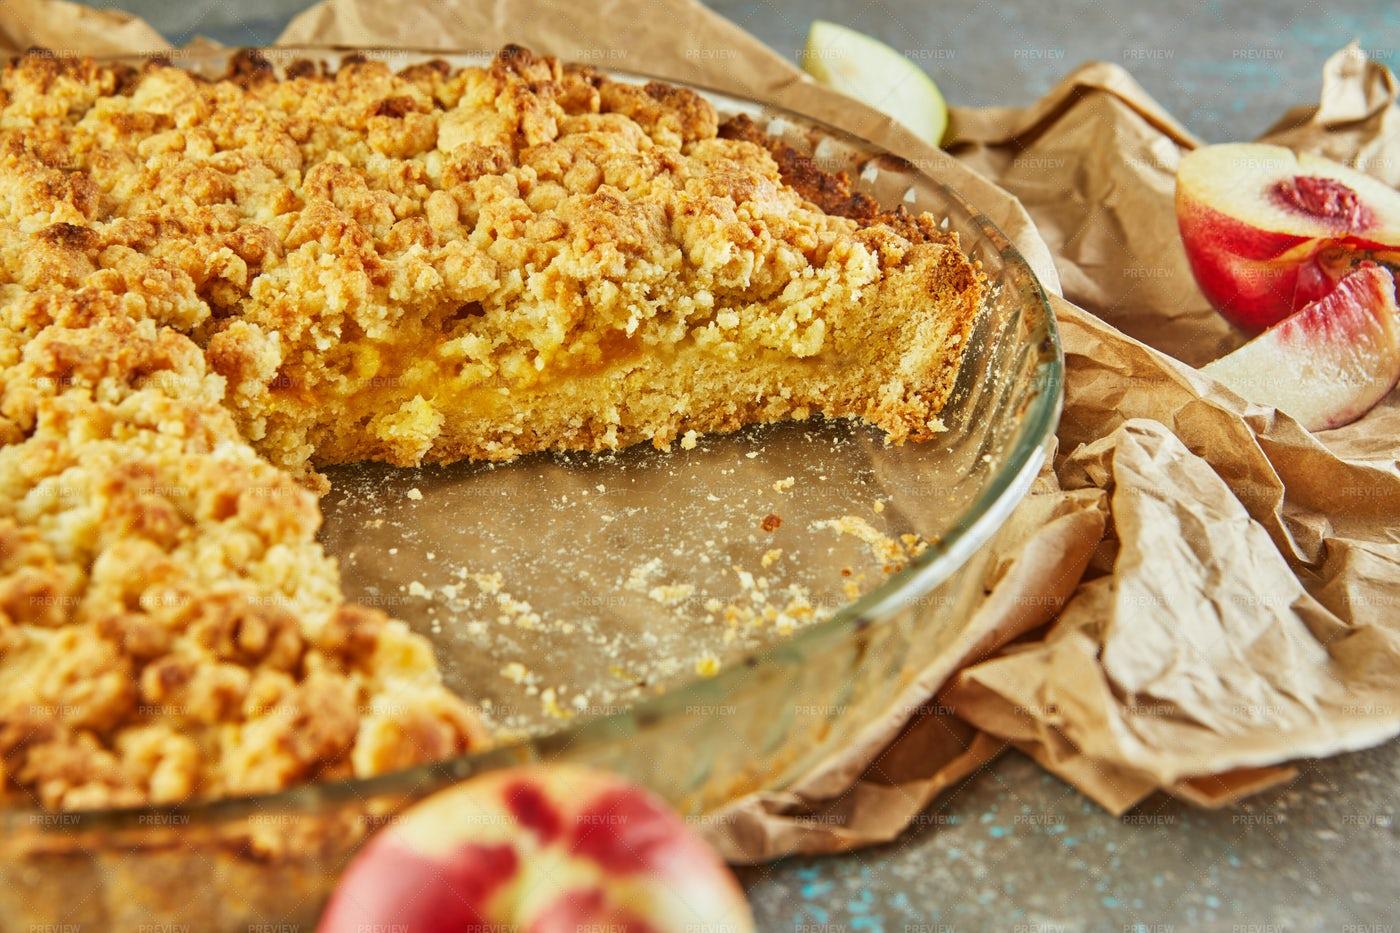 Cake In A Baking Dish: Stock Photos